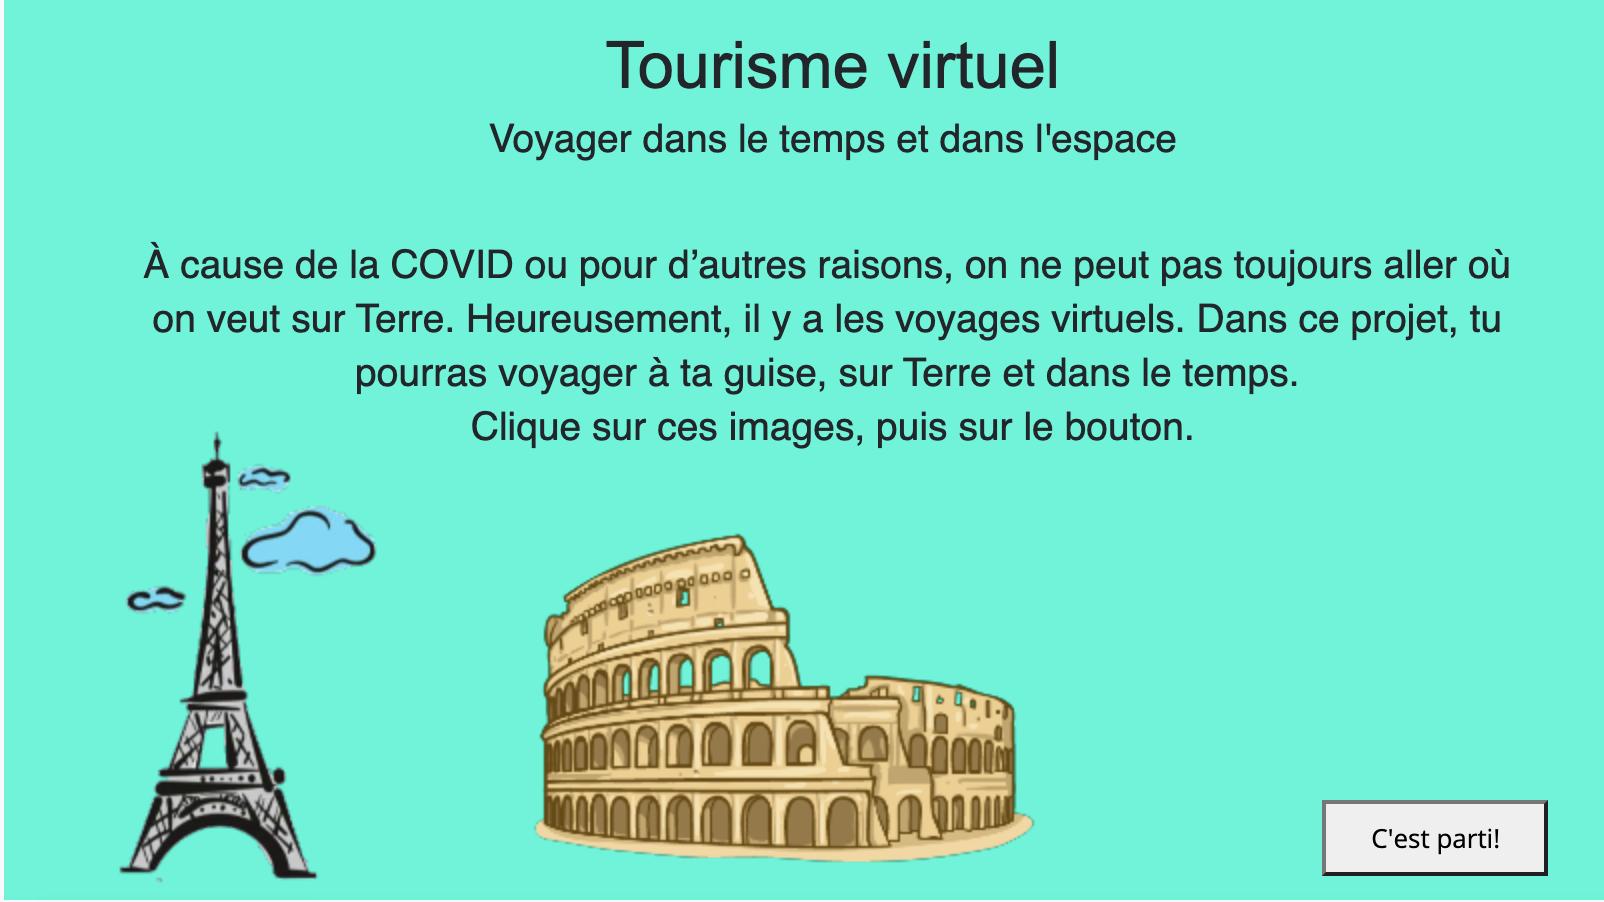 Tourisme virtuel